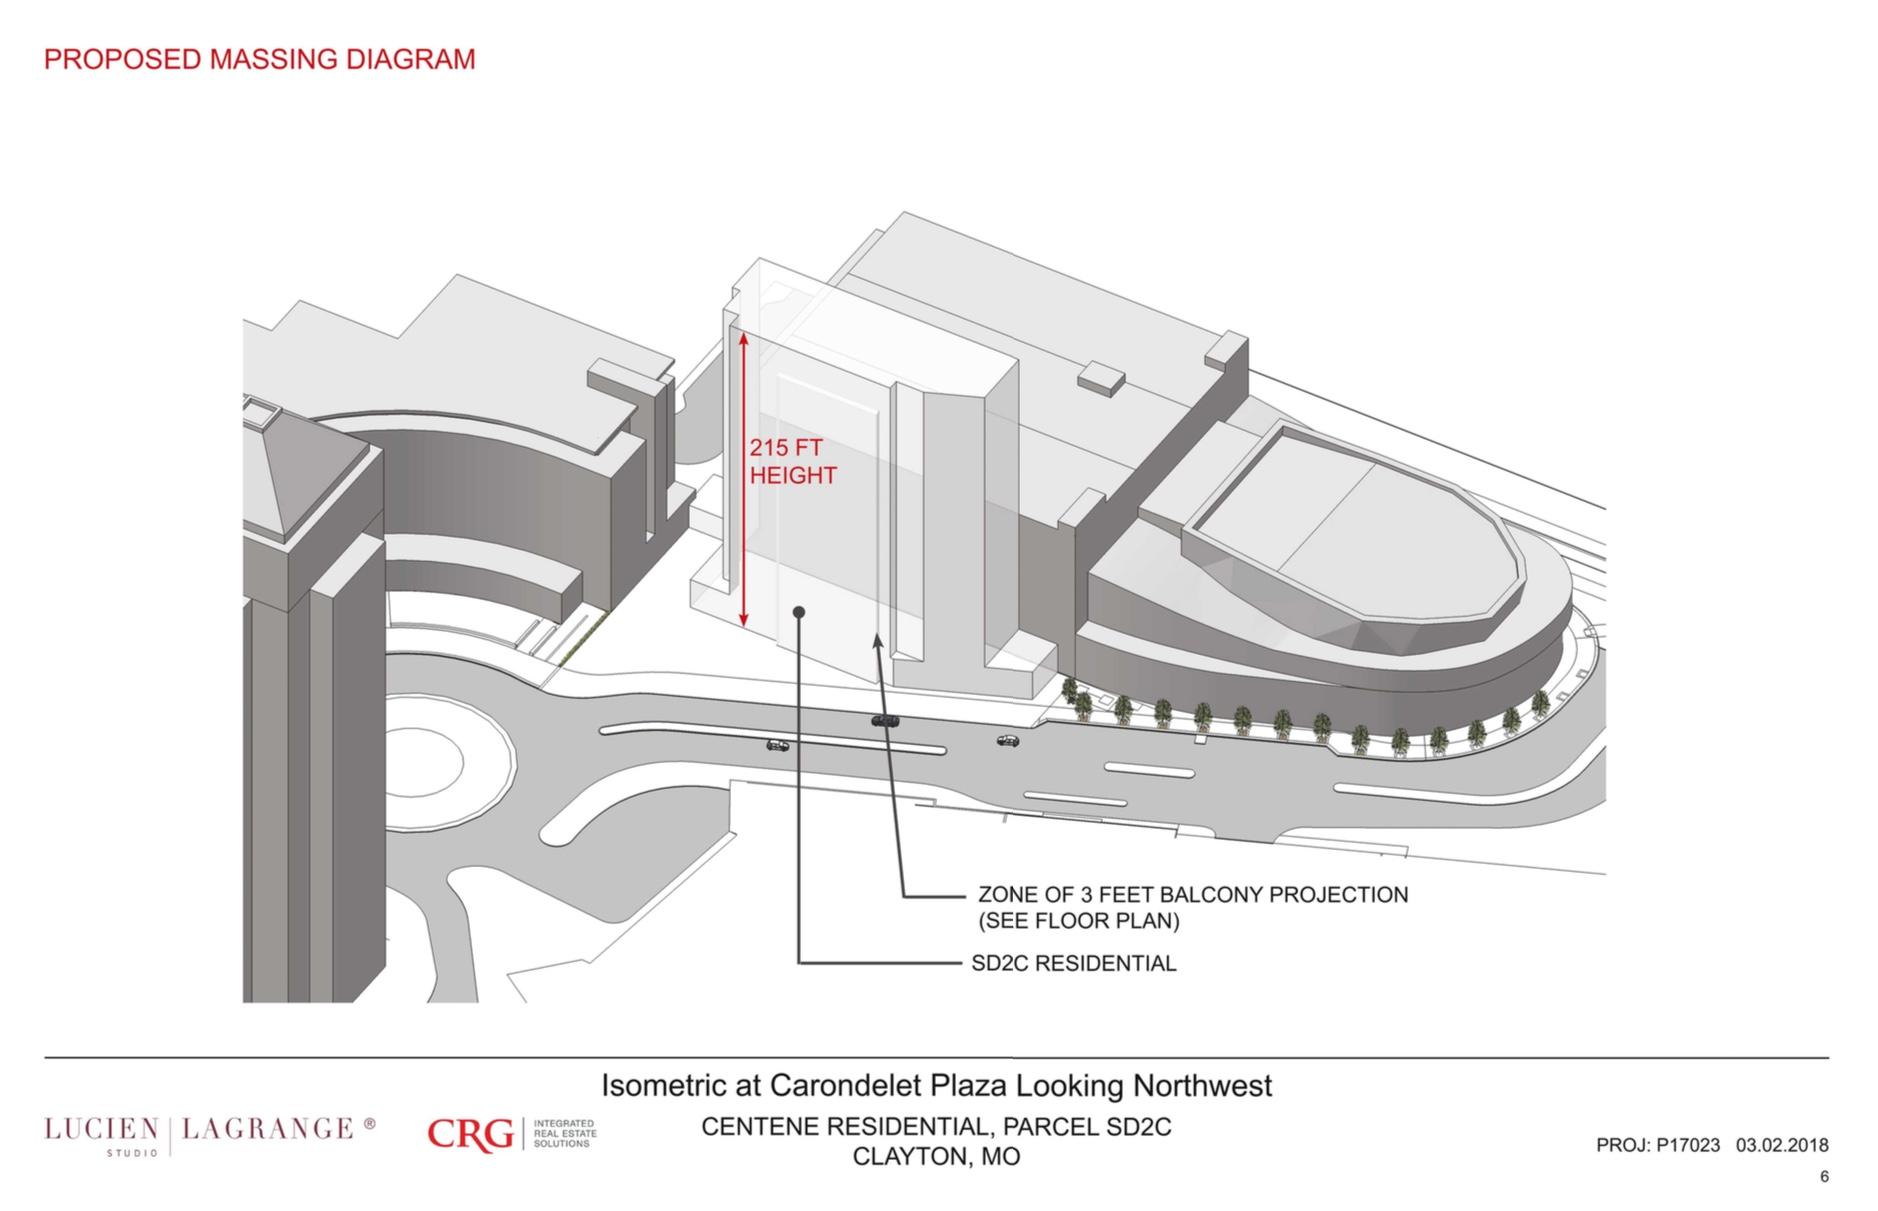 Will Centene's phase 2 residential tower be getting taller?